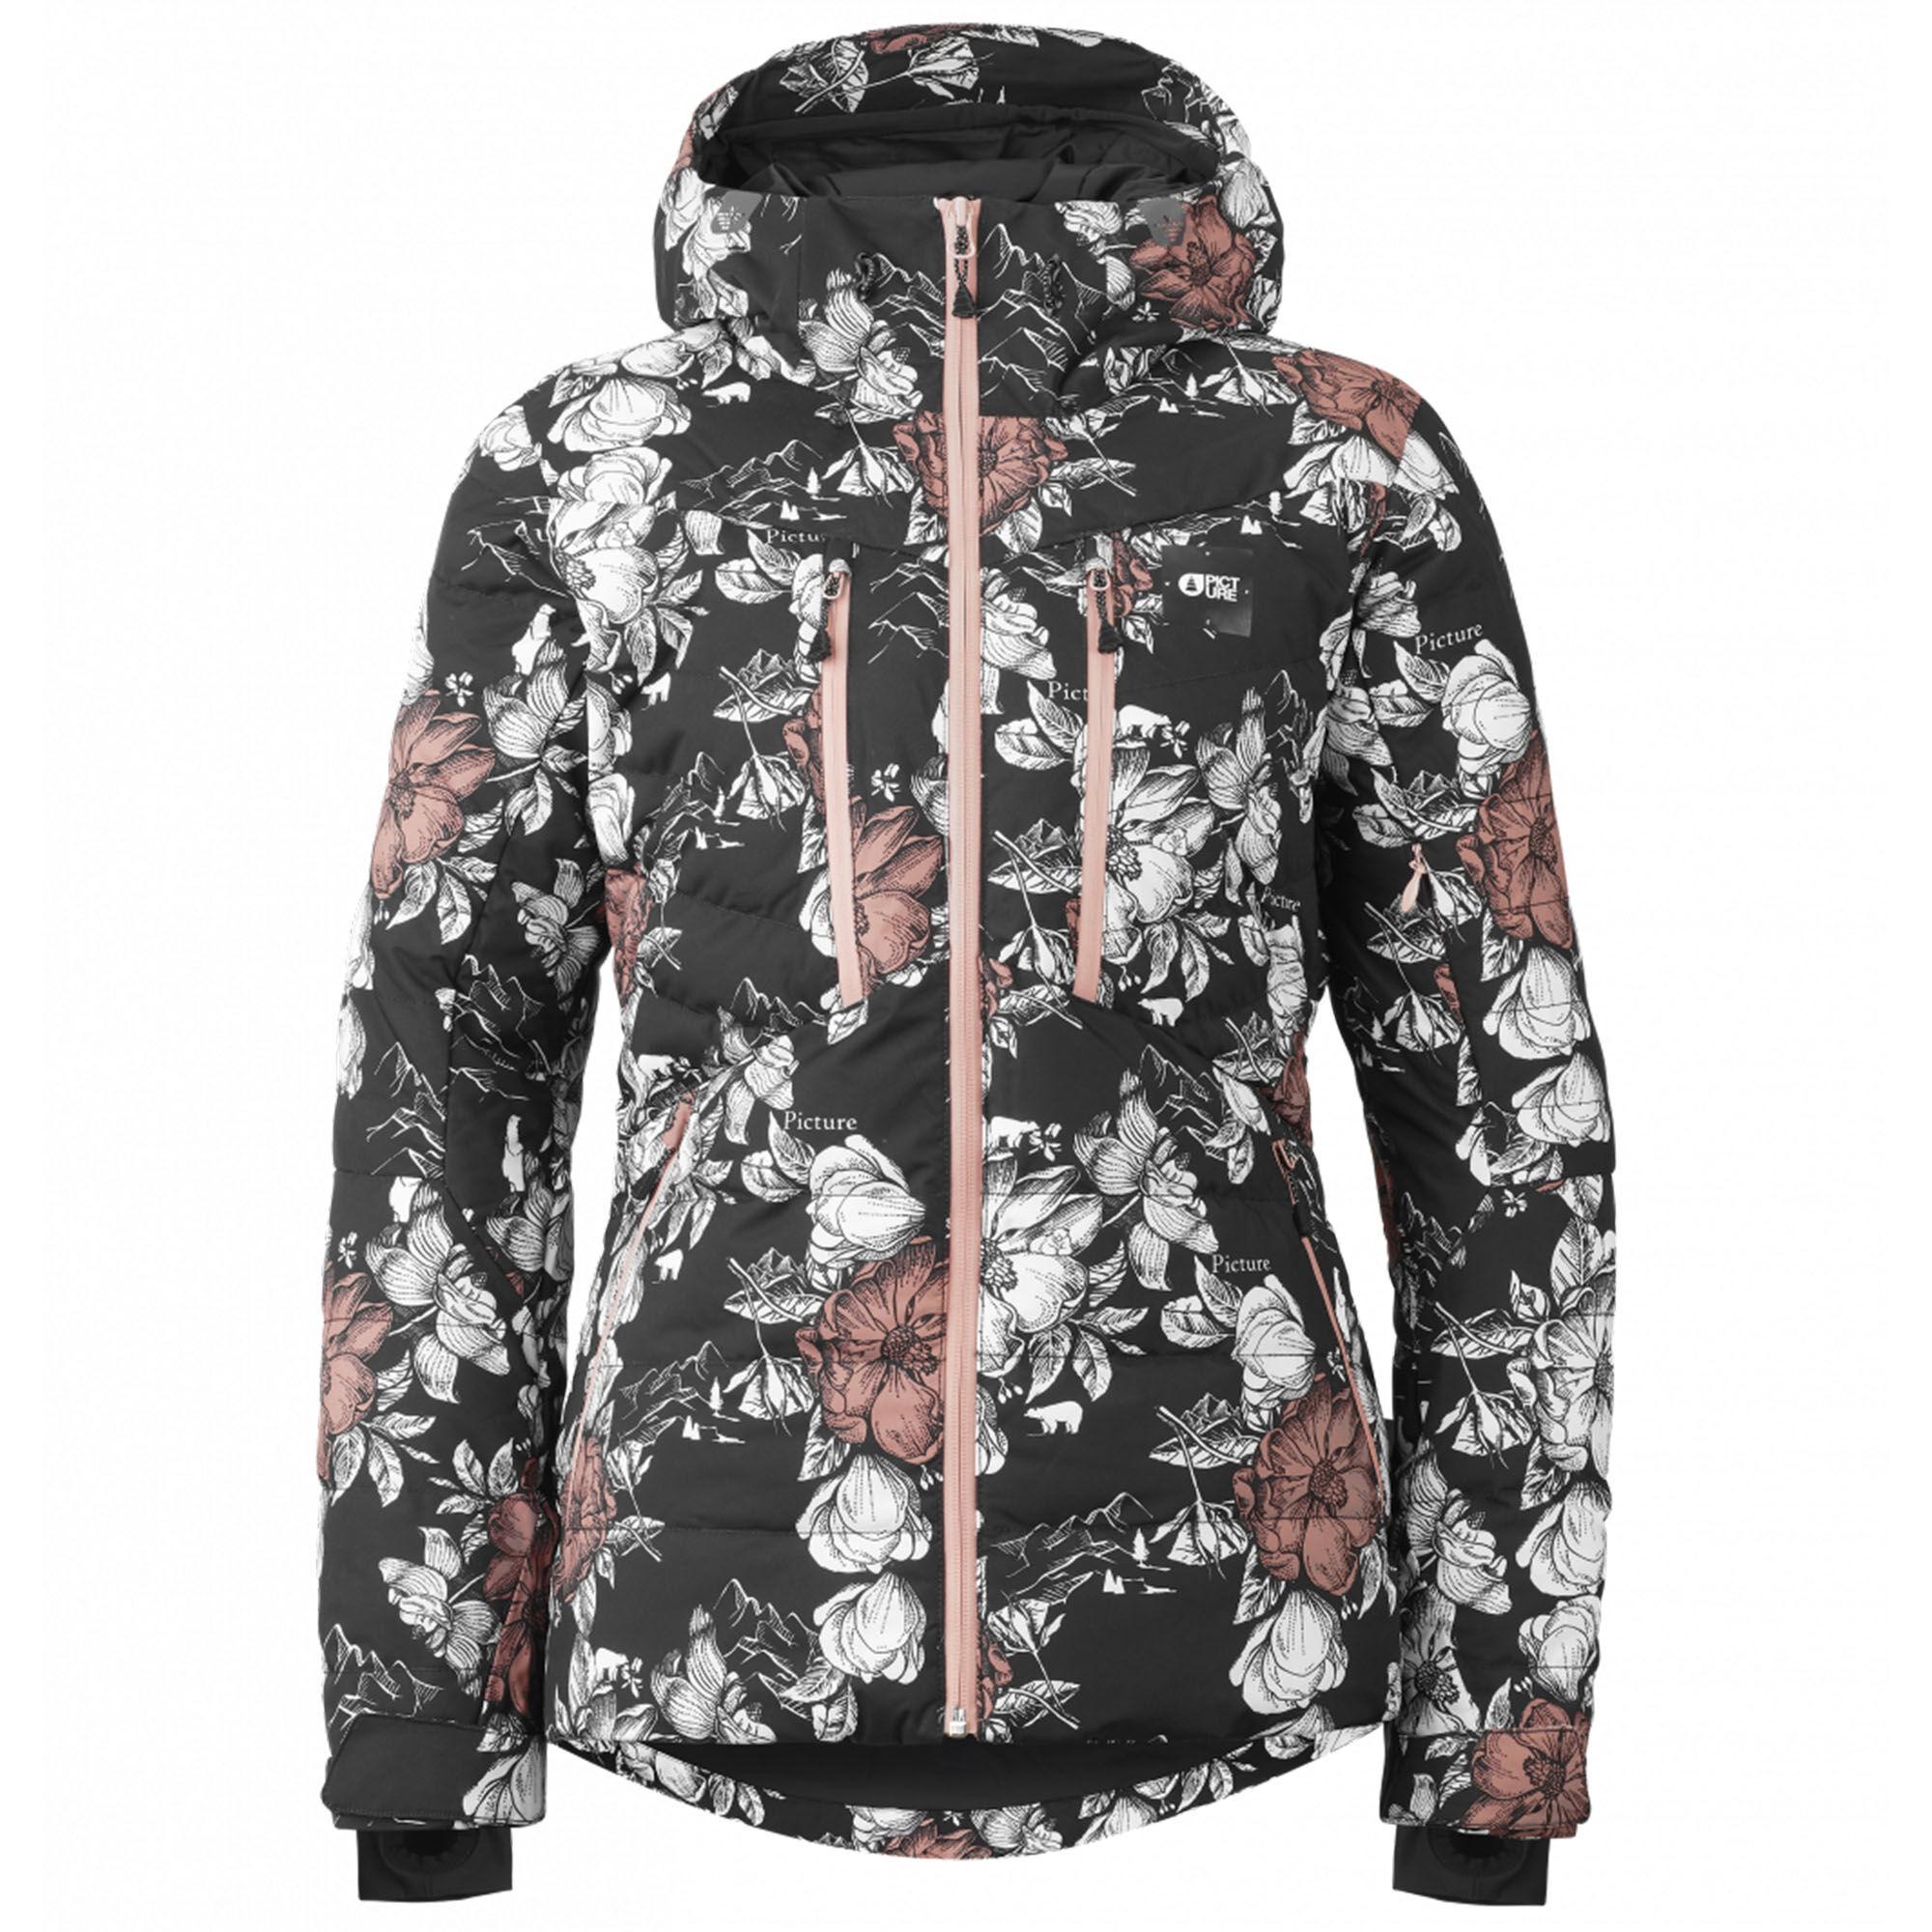 Picture Organic Clothing Women's Pluma Jacket  - Peonies Black - Size: Large